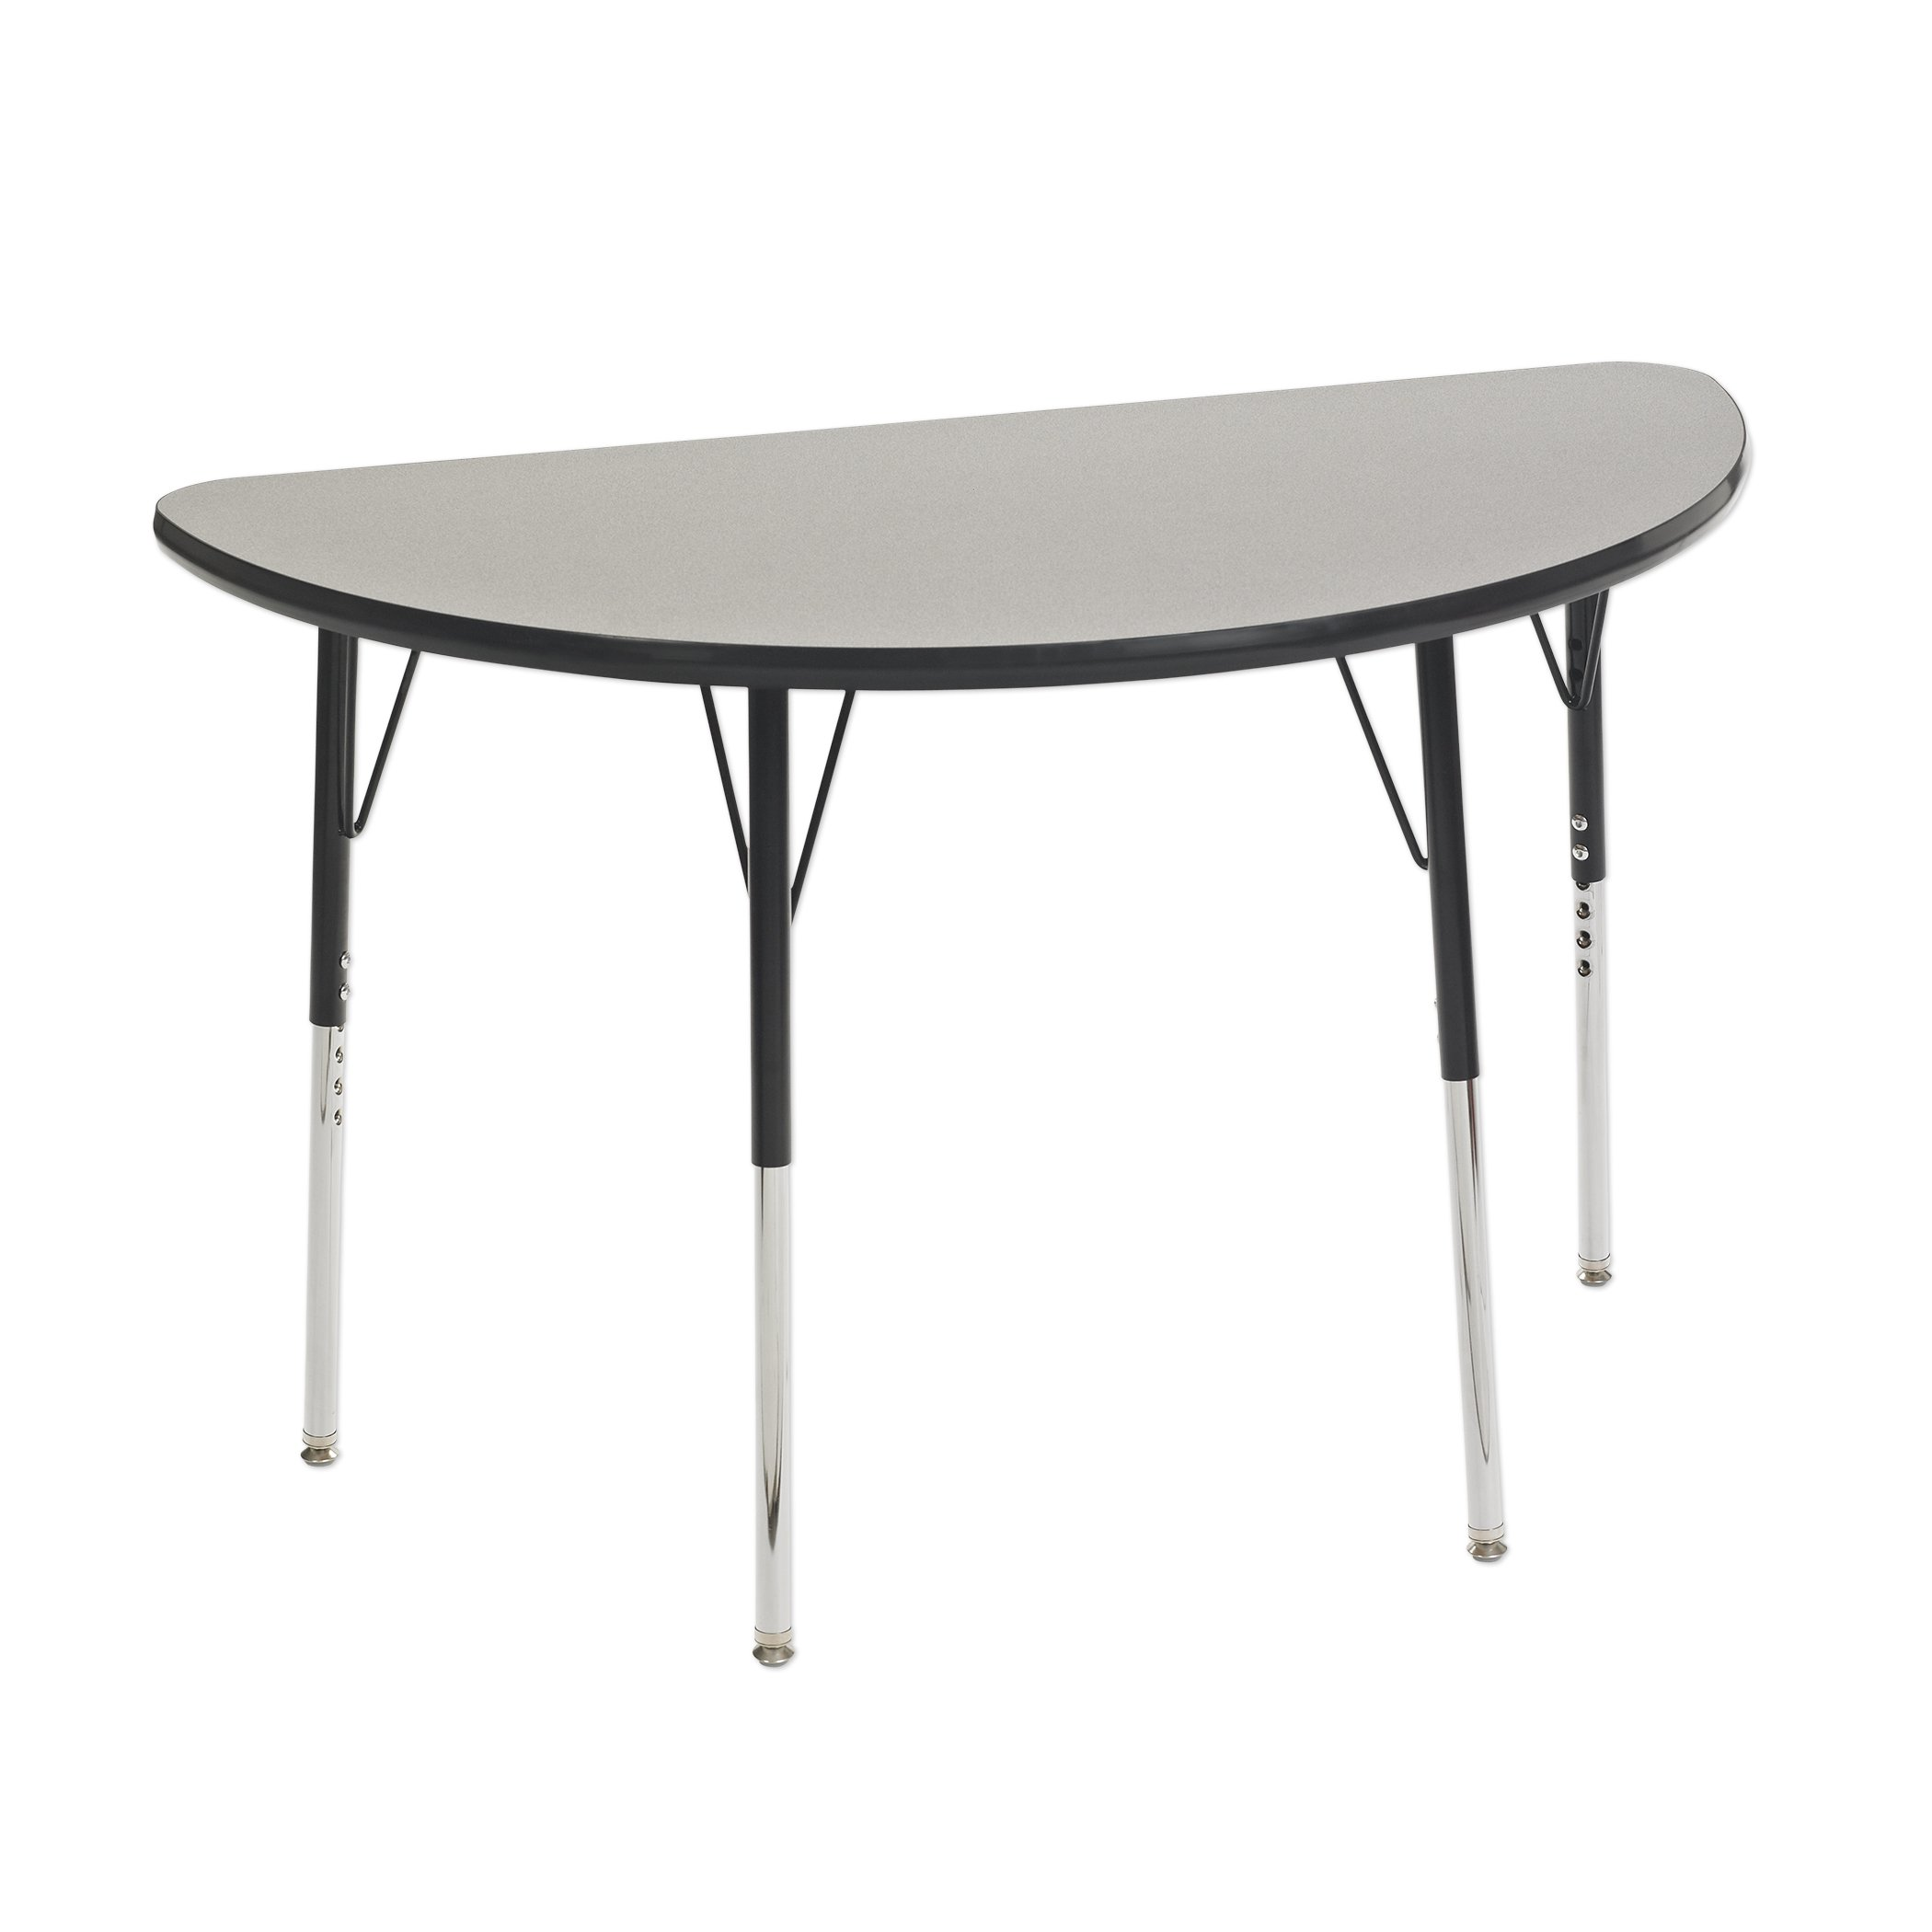 ECR4Kids Mesa T-Mold 24'' x 48'' Half Round School Activity Table, Toddler Legs w/ Swivel Glides, Adjustable Height 15-23 inch (Grey/Black)